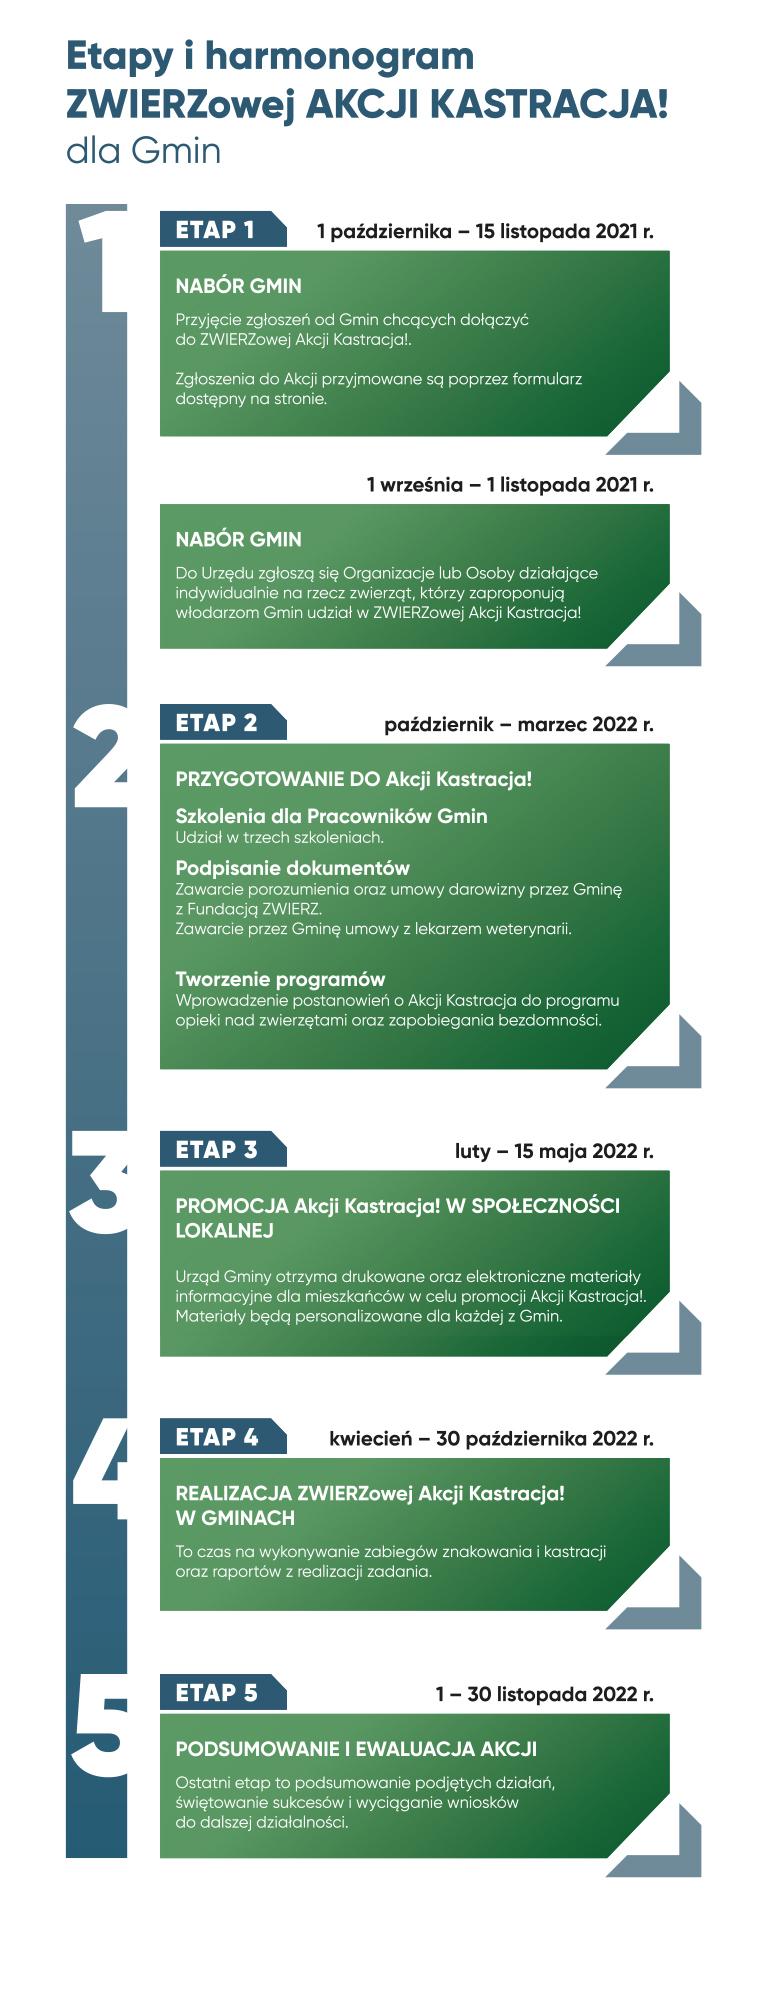 2021 etapy i harmonogram-dla gmin